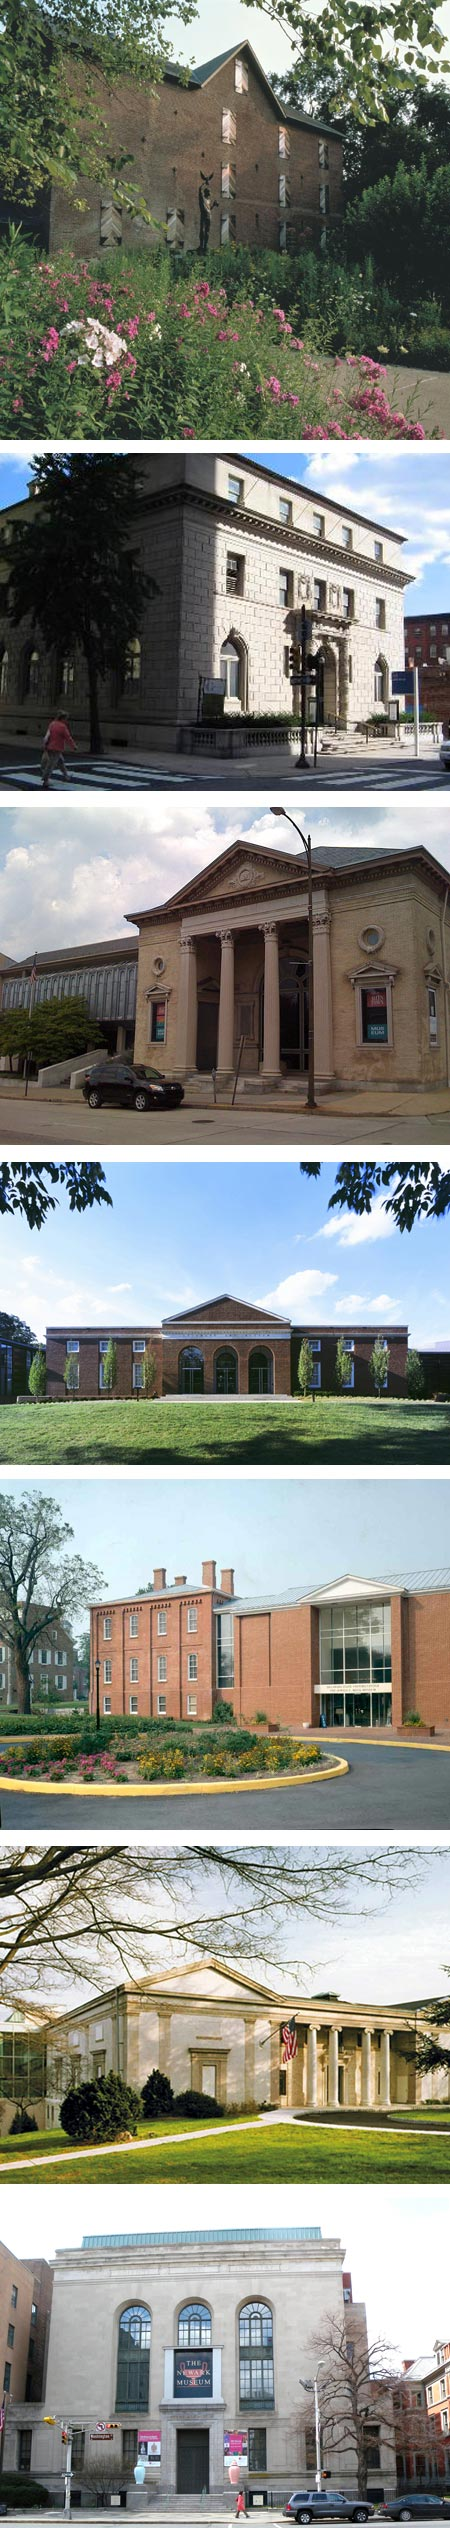 Museum Day, 2012: Brandywine River Museum, Philadelphia Art Alliance, Allentown Art Museum, Delaware Art Museum, Biggs Museum of American Art, Montclair Museum, Newark Museum